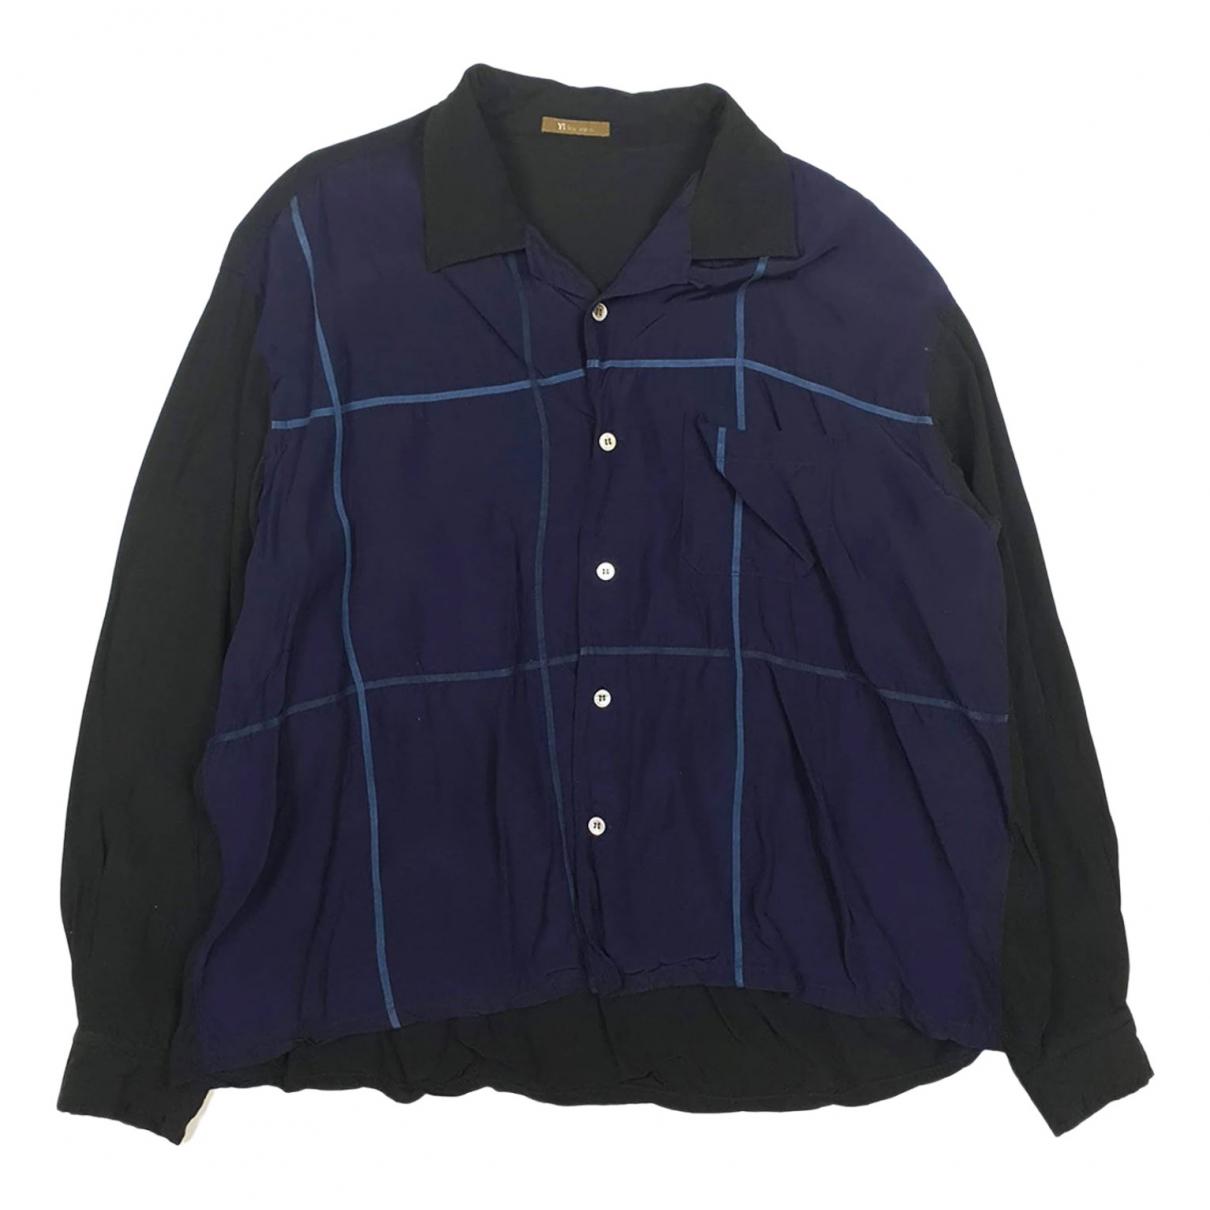 Y's \N Blue Shirts for Men M International